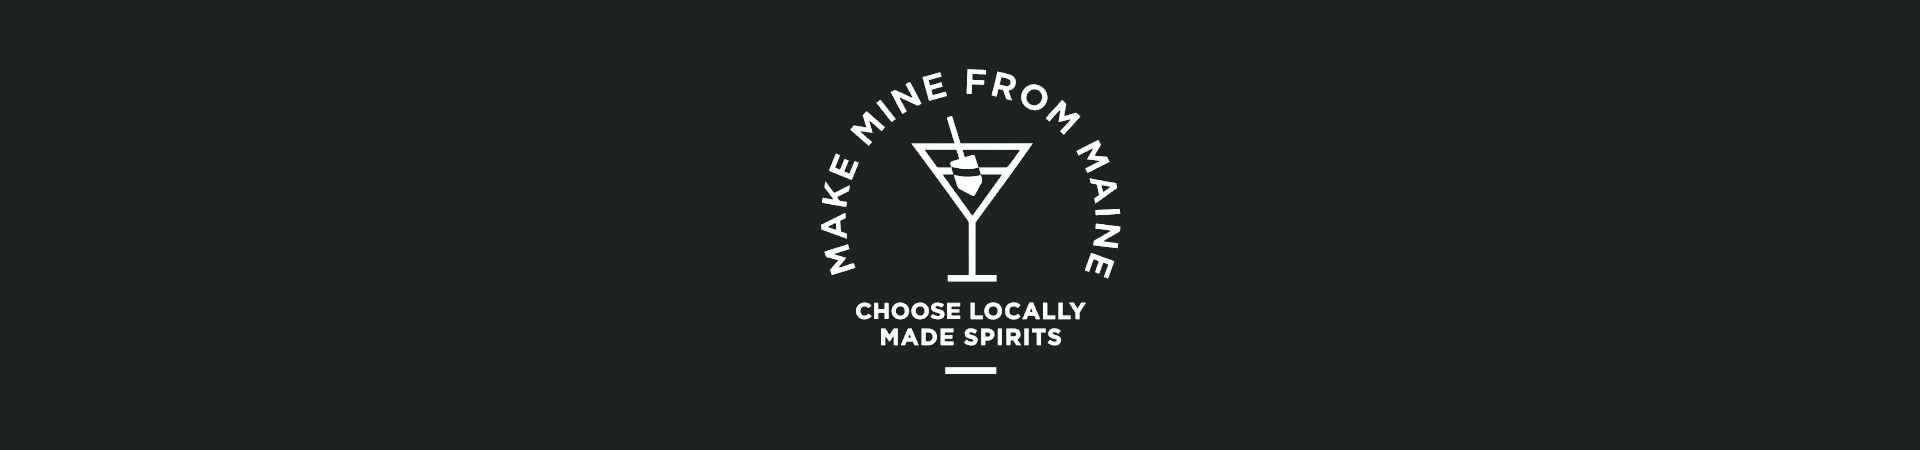 Make mine from Maine - Choose locally made spirits